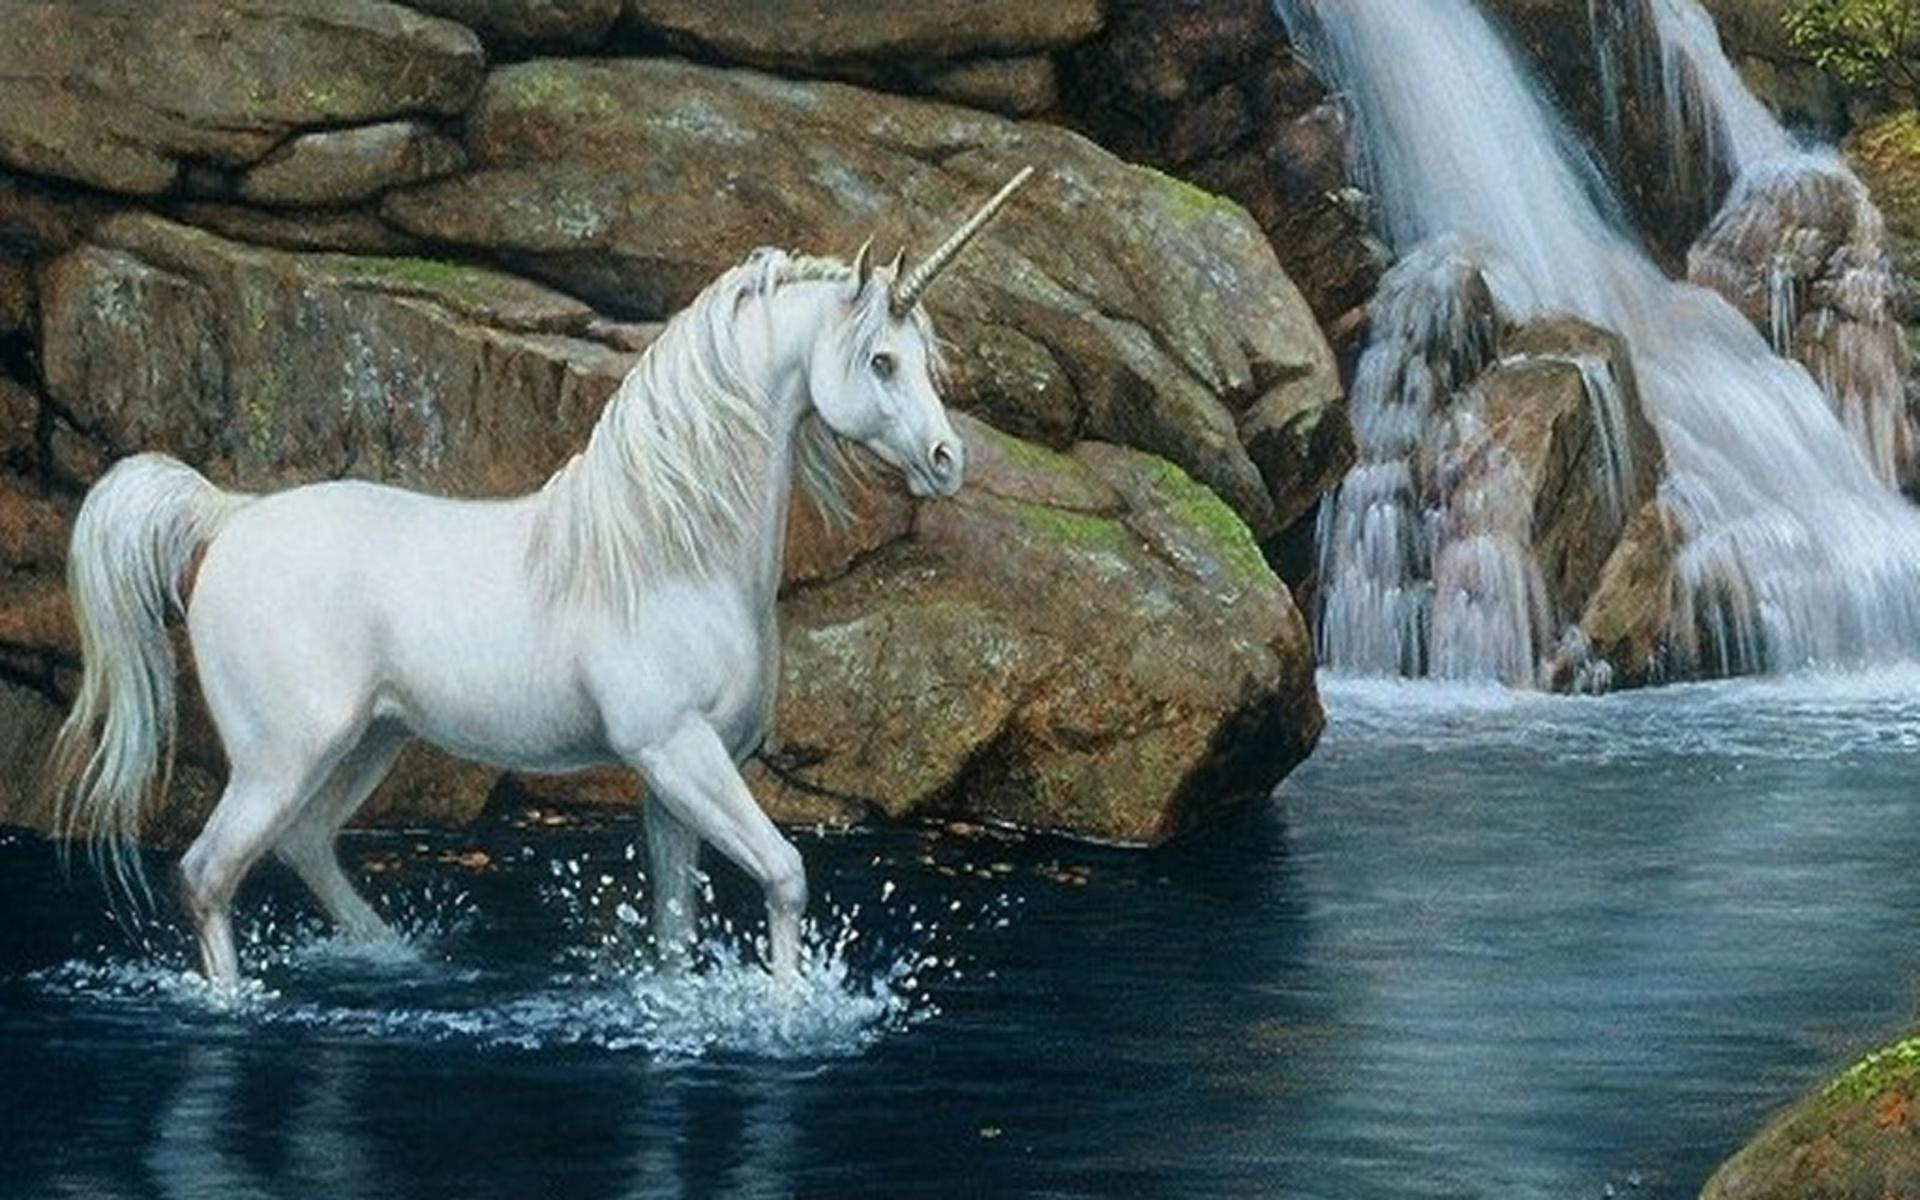 Free Download Horse Wallpaper Hd 1080p Desktop Backgrounds For Hd